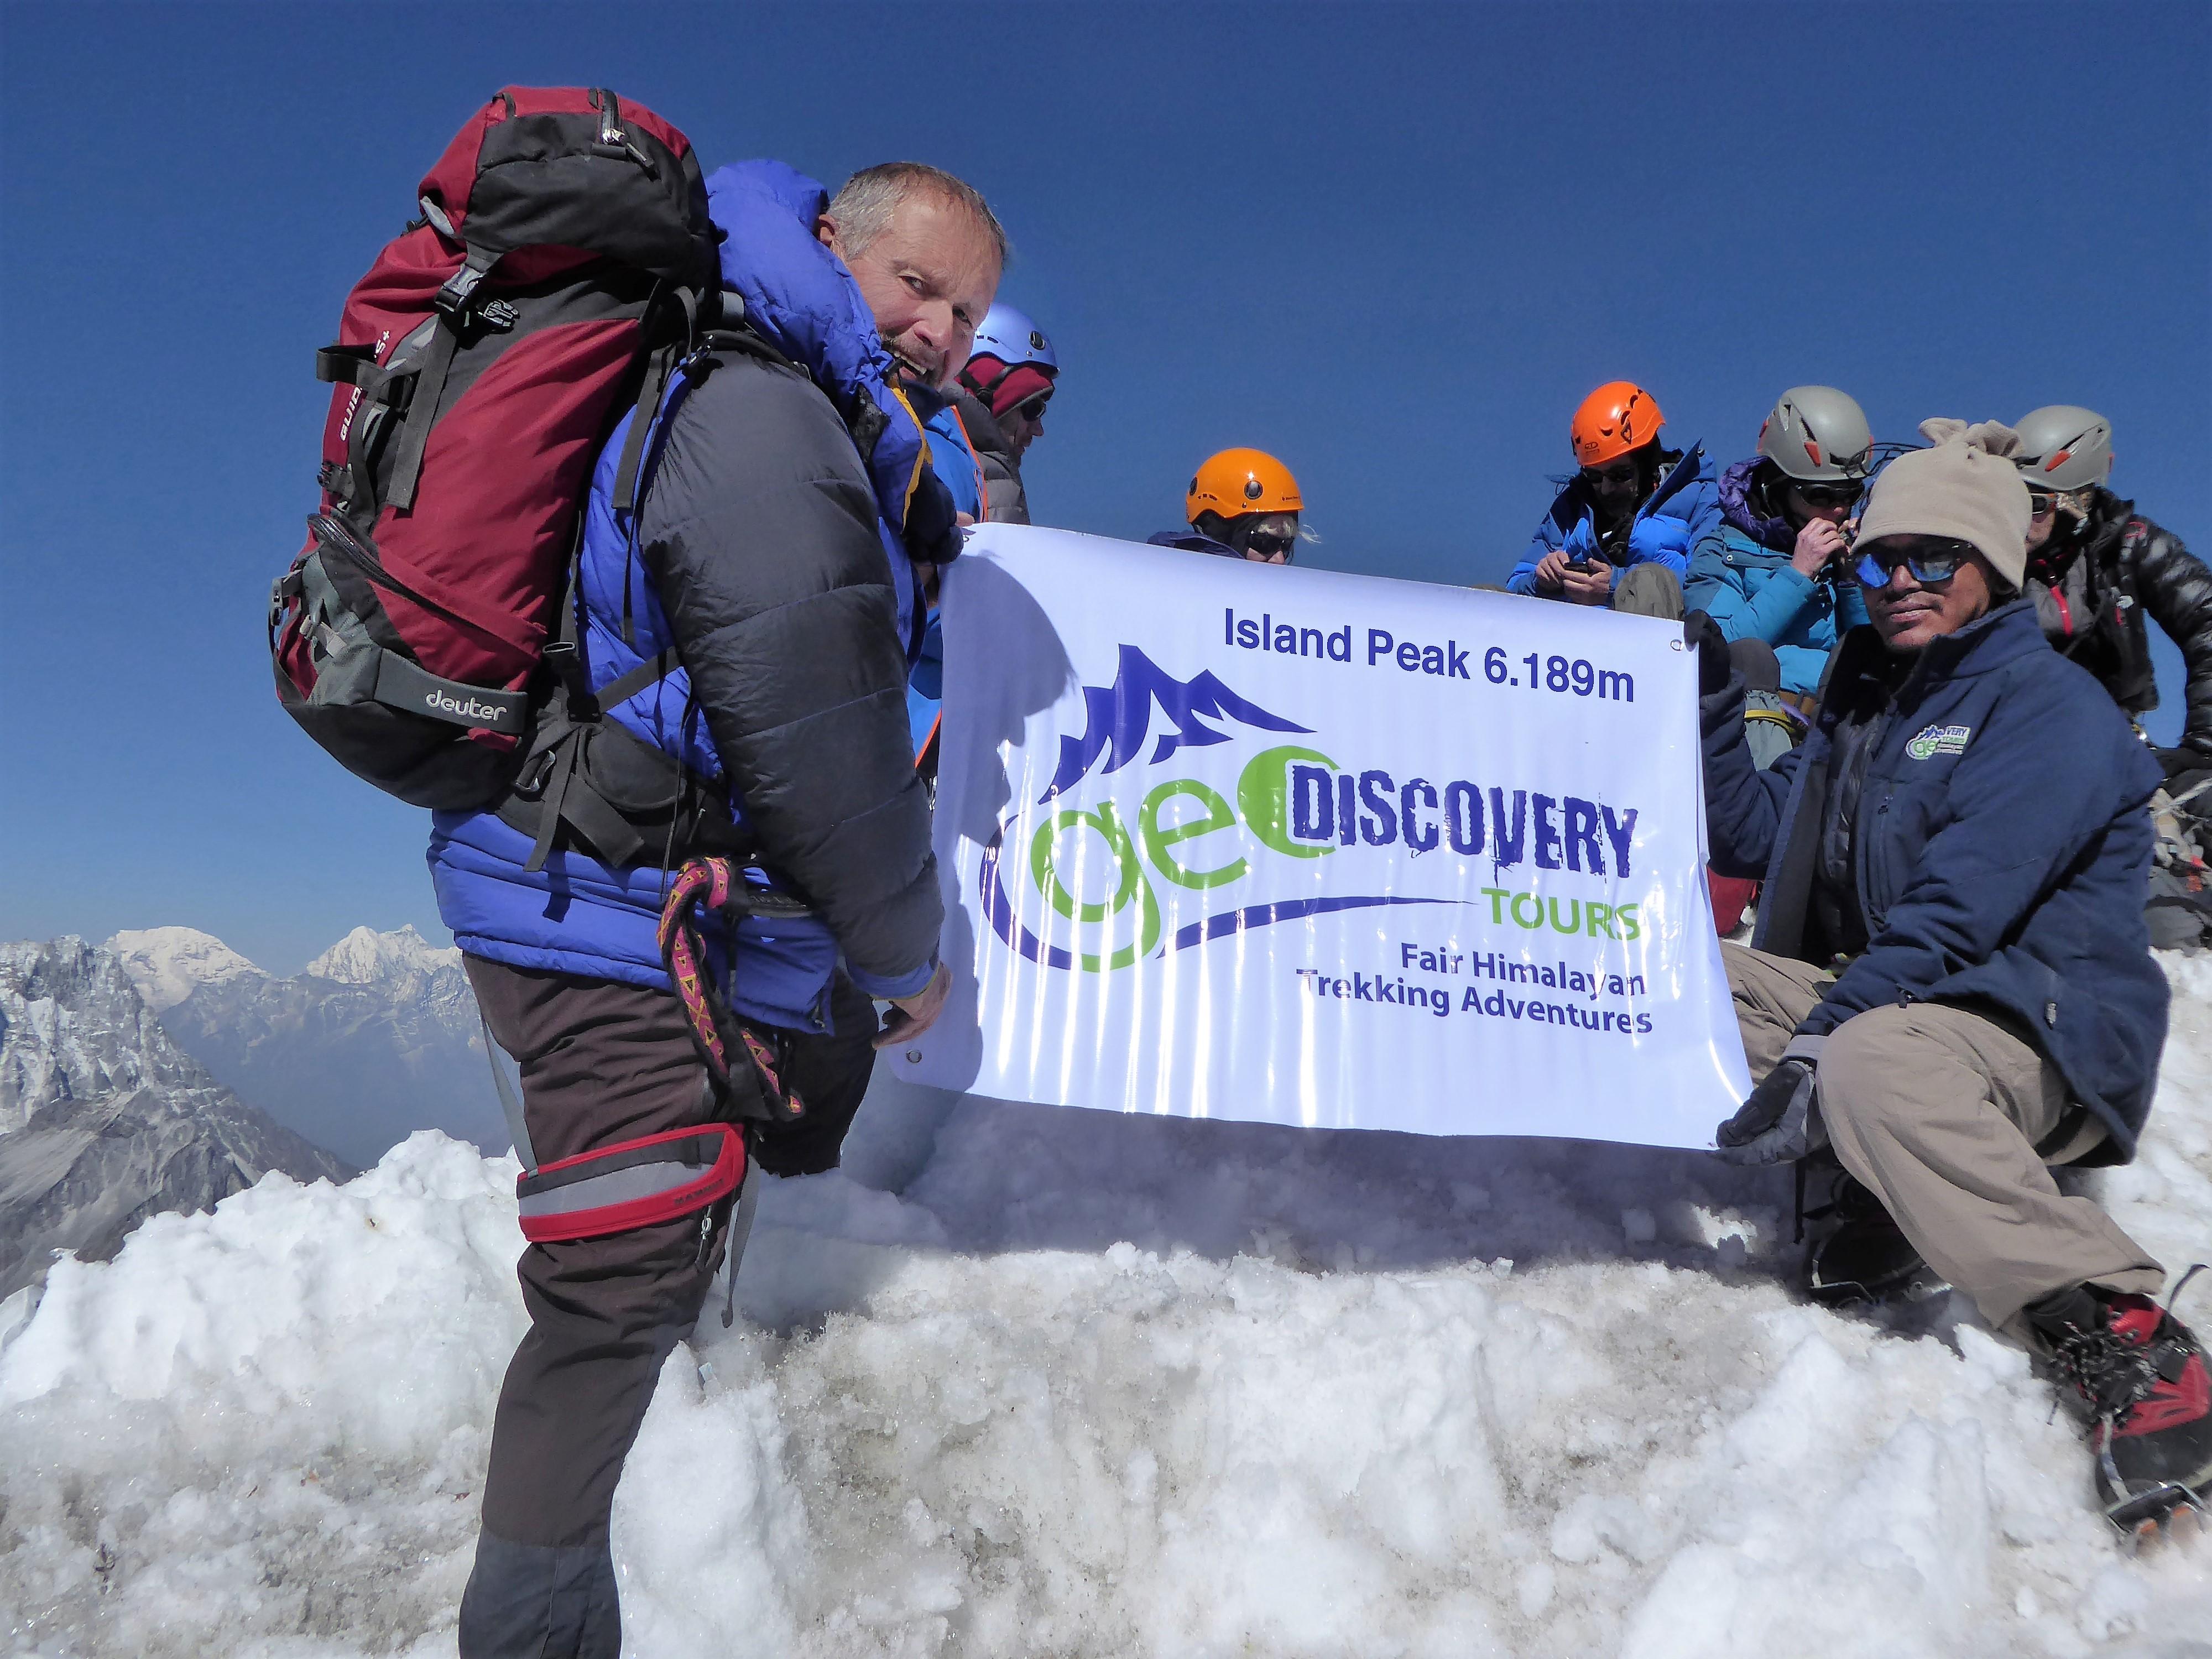 Island Peak expedition April 2016